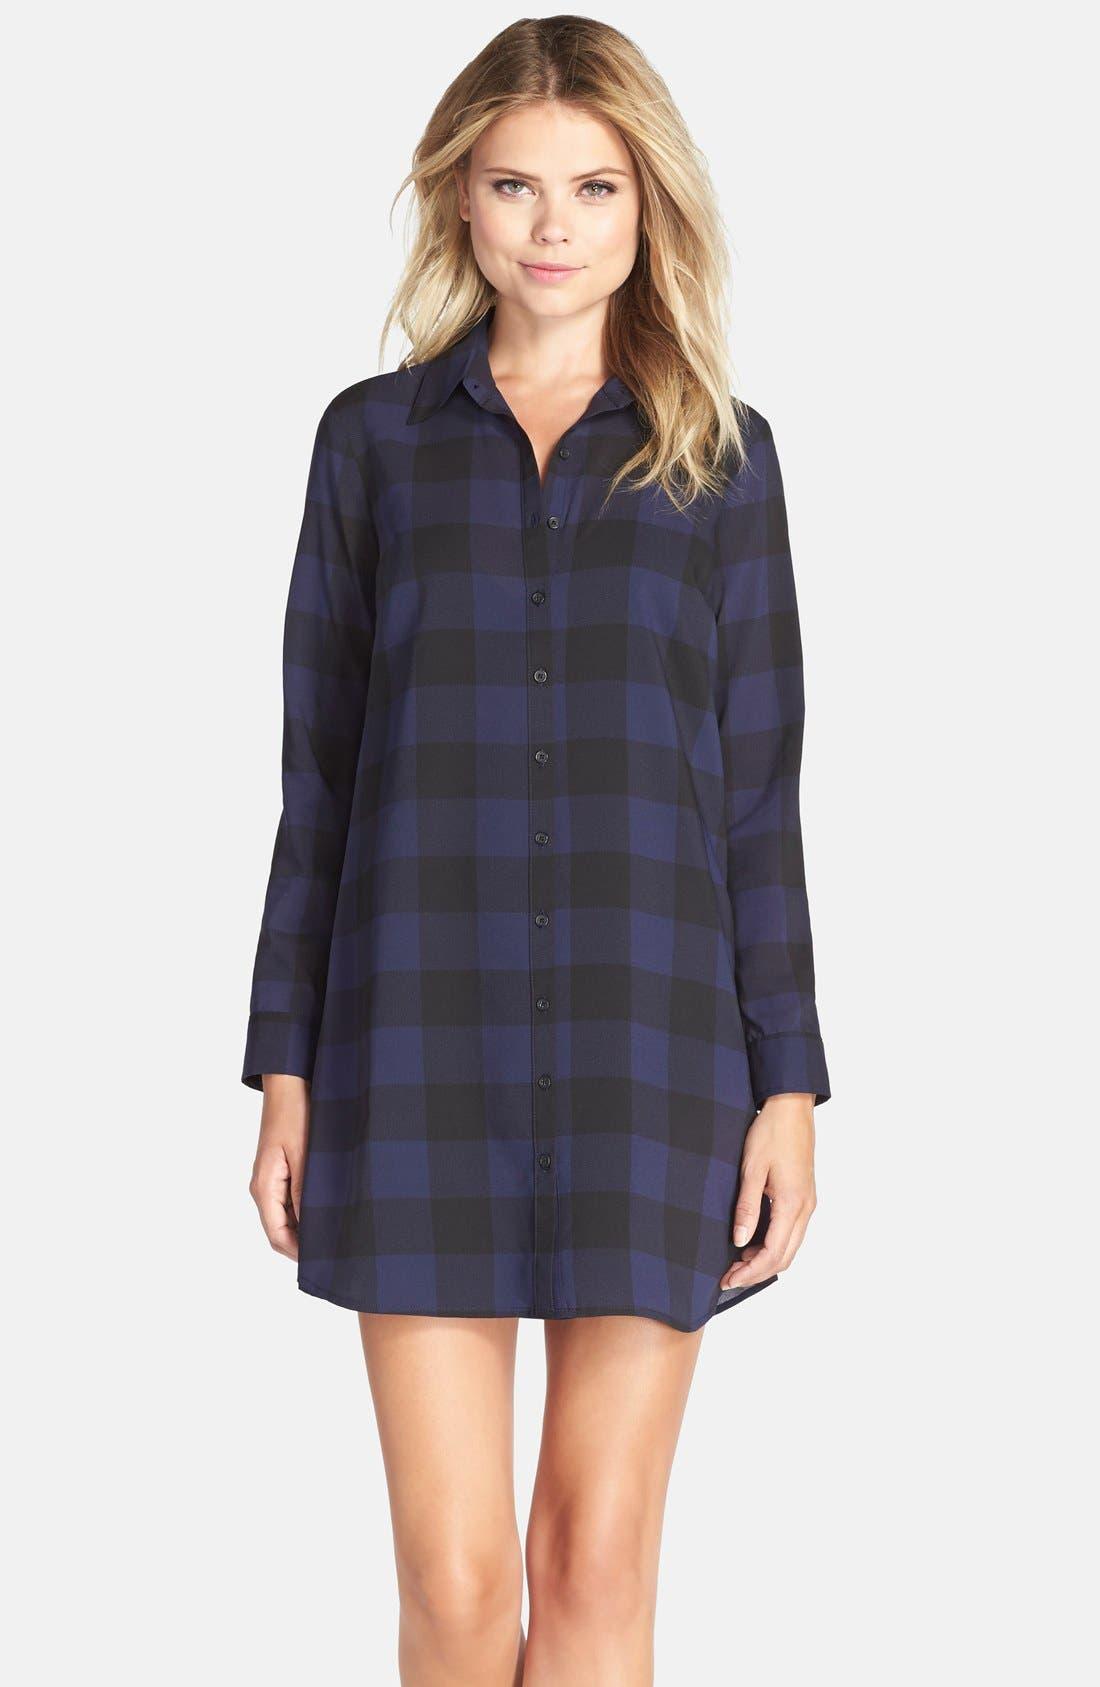 Alternate Image 1 Selected - BB Dakota 'Cotter' Plaid Shirtdress